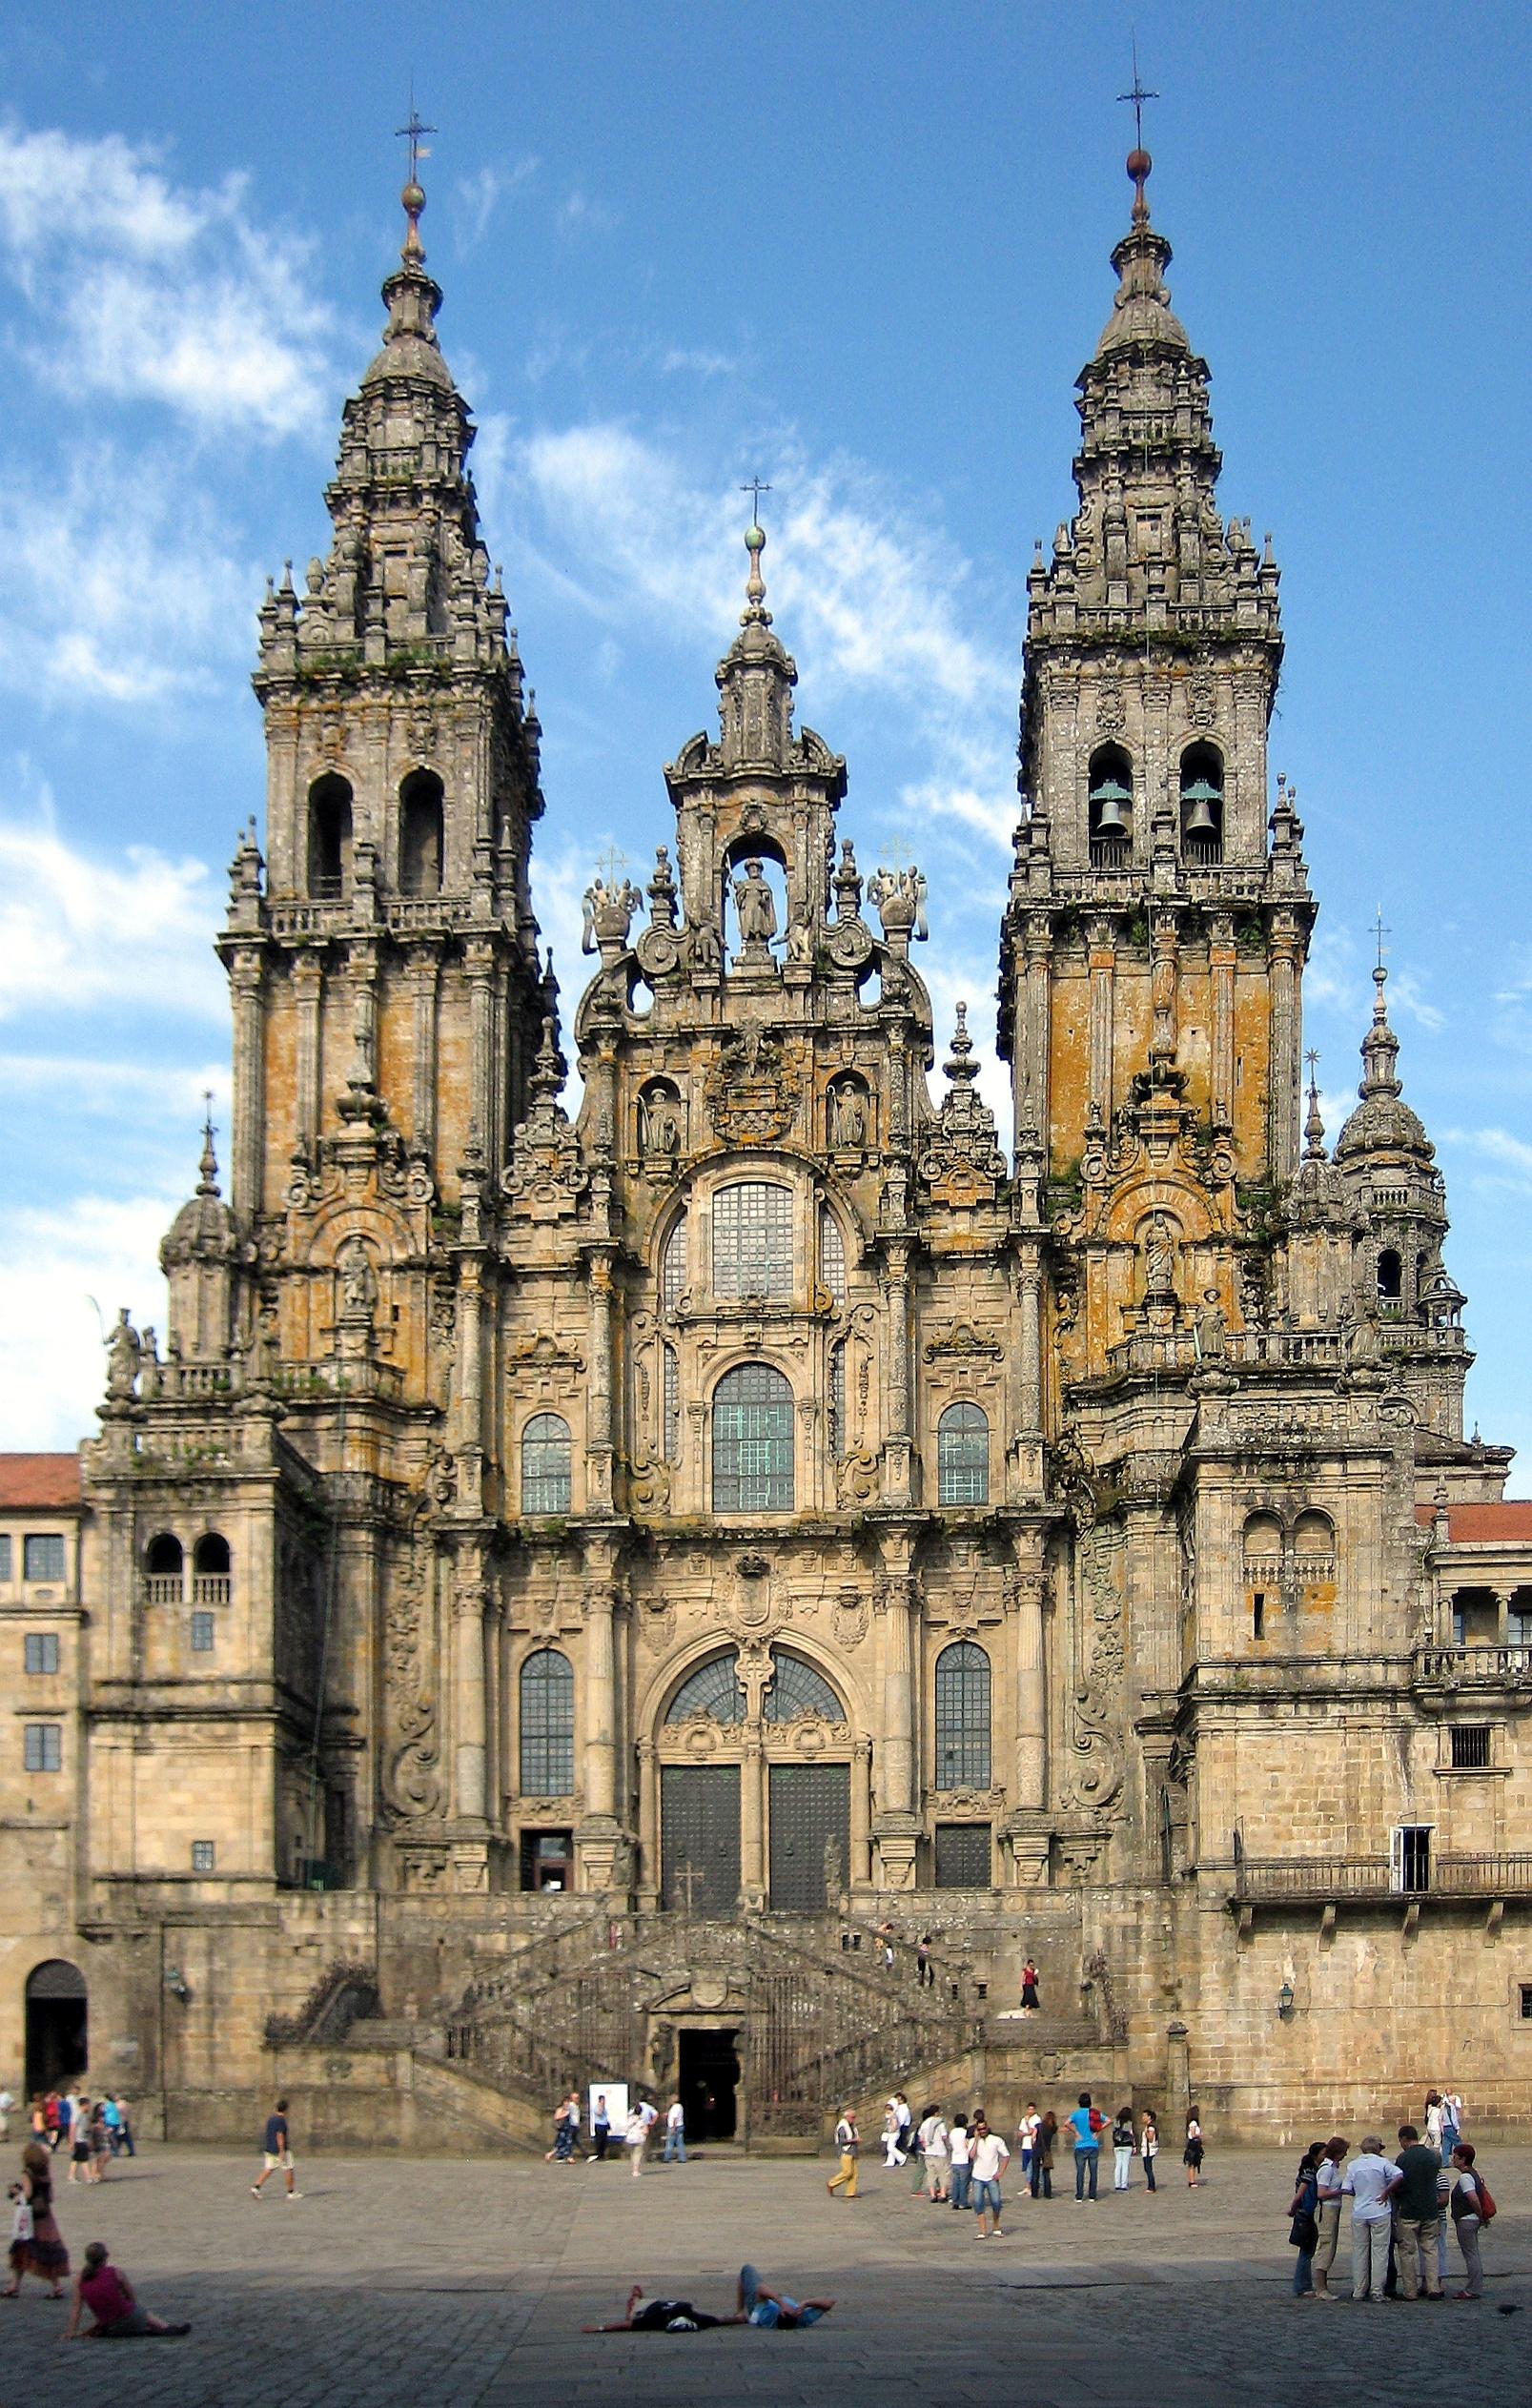 Kathedrale von santiago de compostela wikipedia - Intiriror picture ...